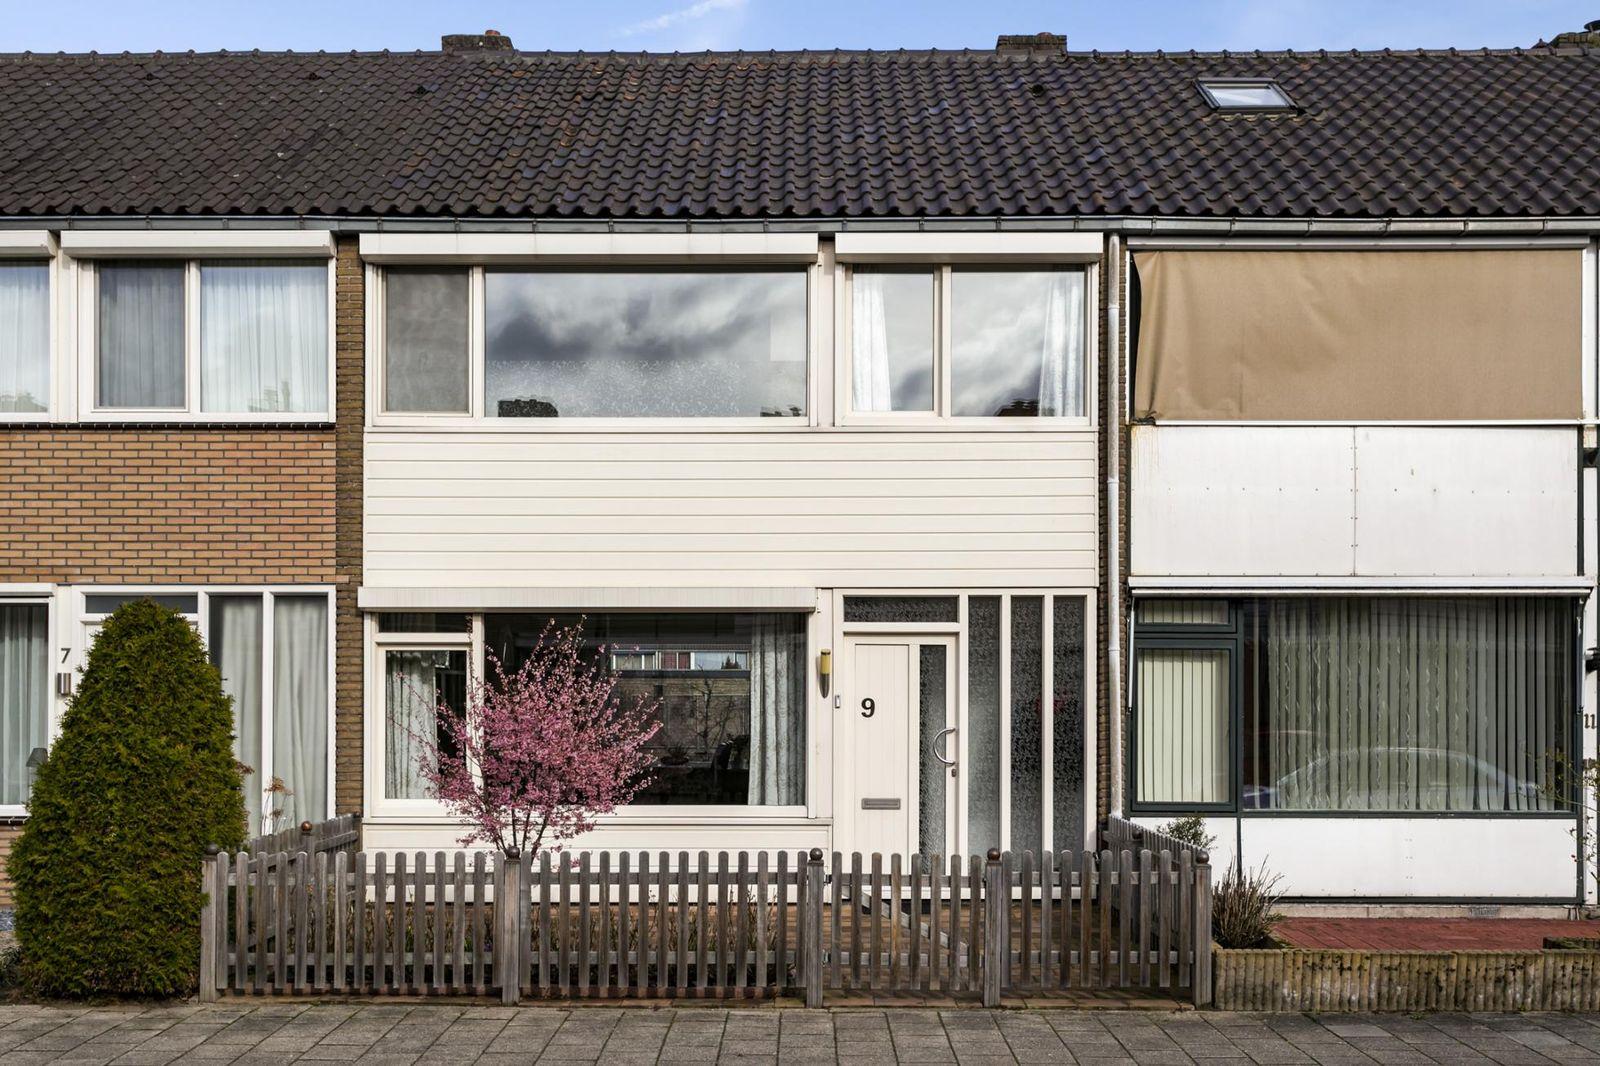 Teisterbantstraat 9, Arnhem